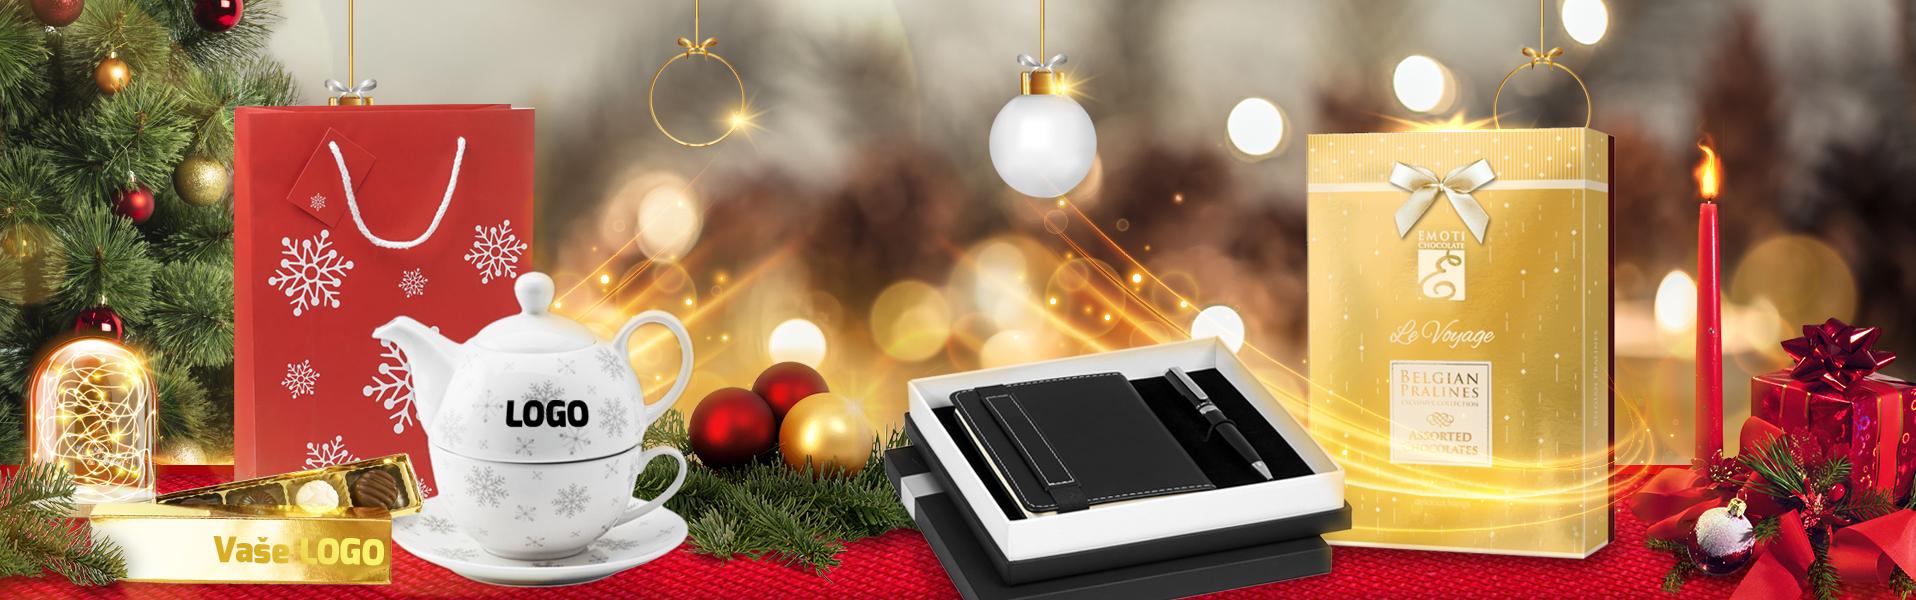 FB_FEED_Vánoční banner_1920x600